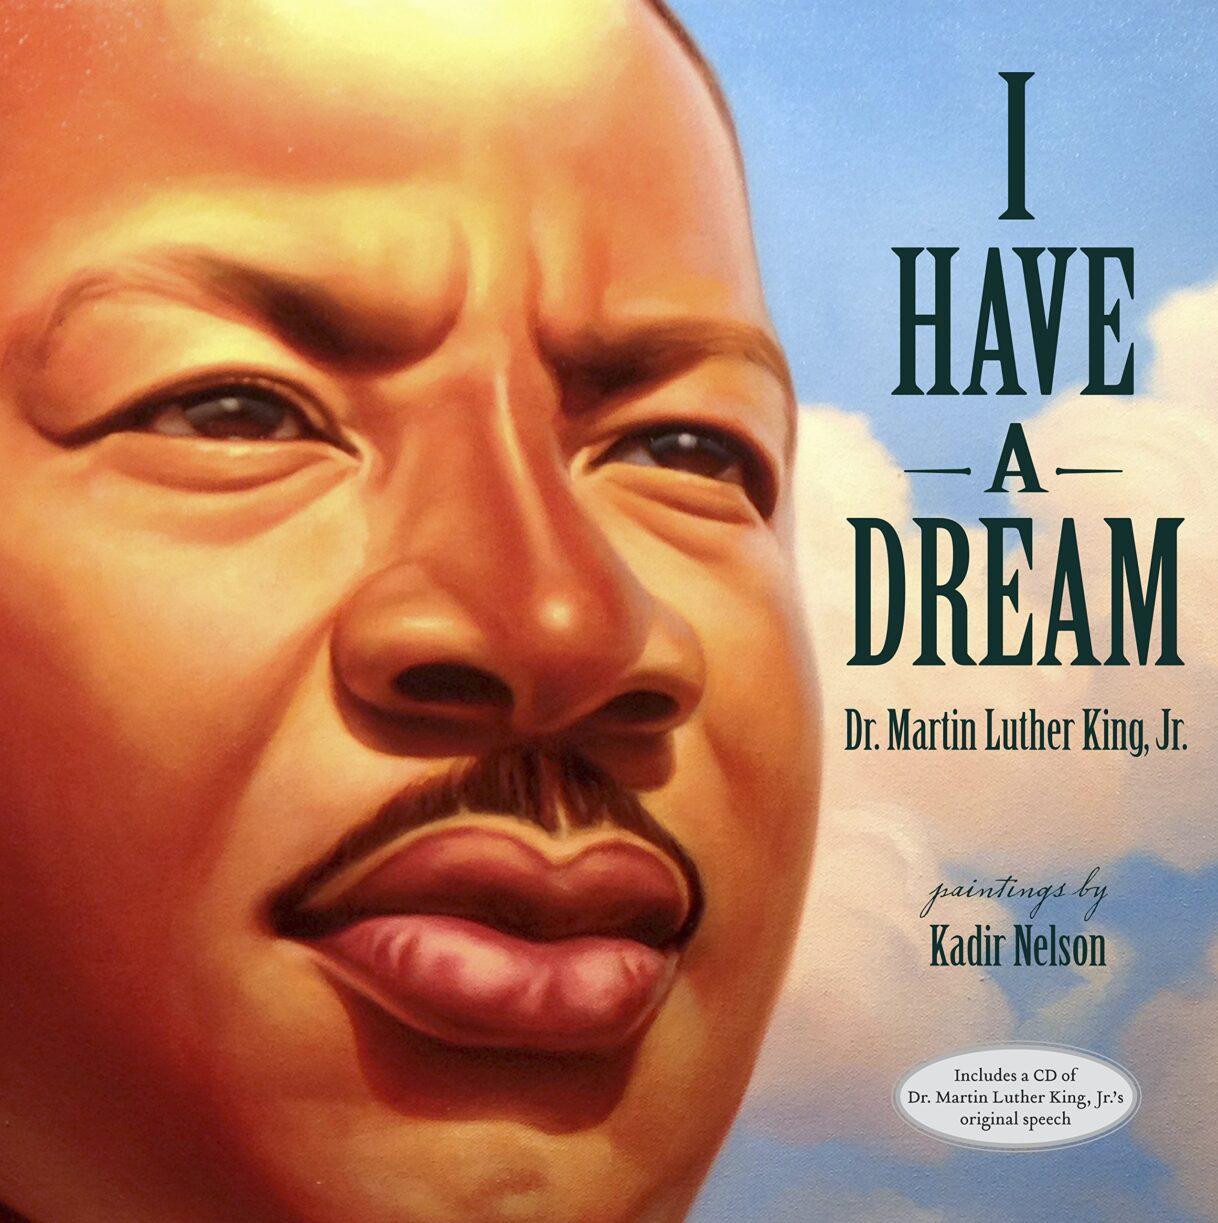 Biography: Rev. Dr. Martin Luther King, Jr